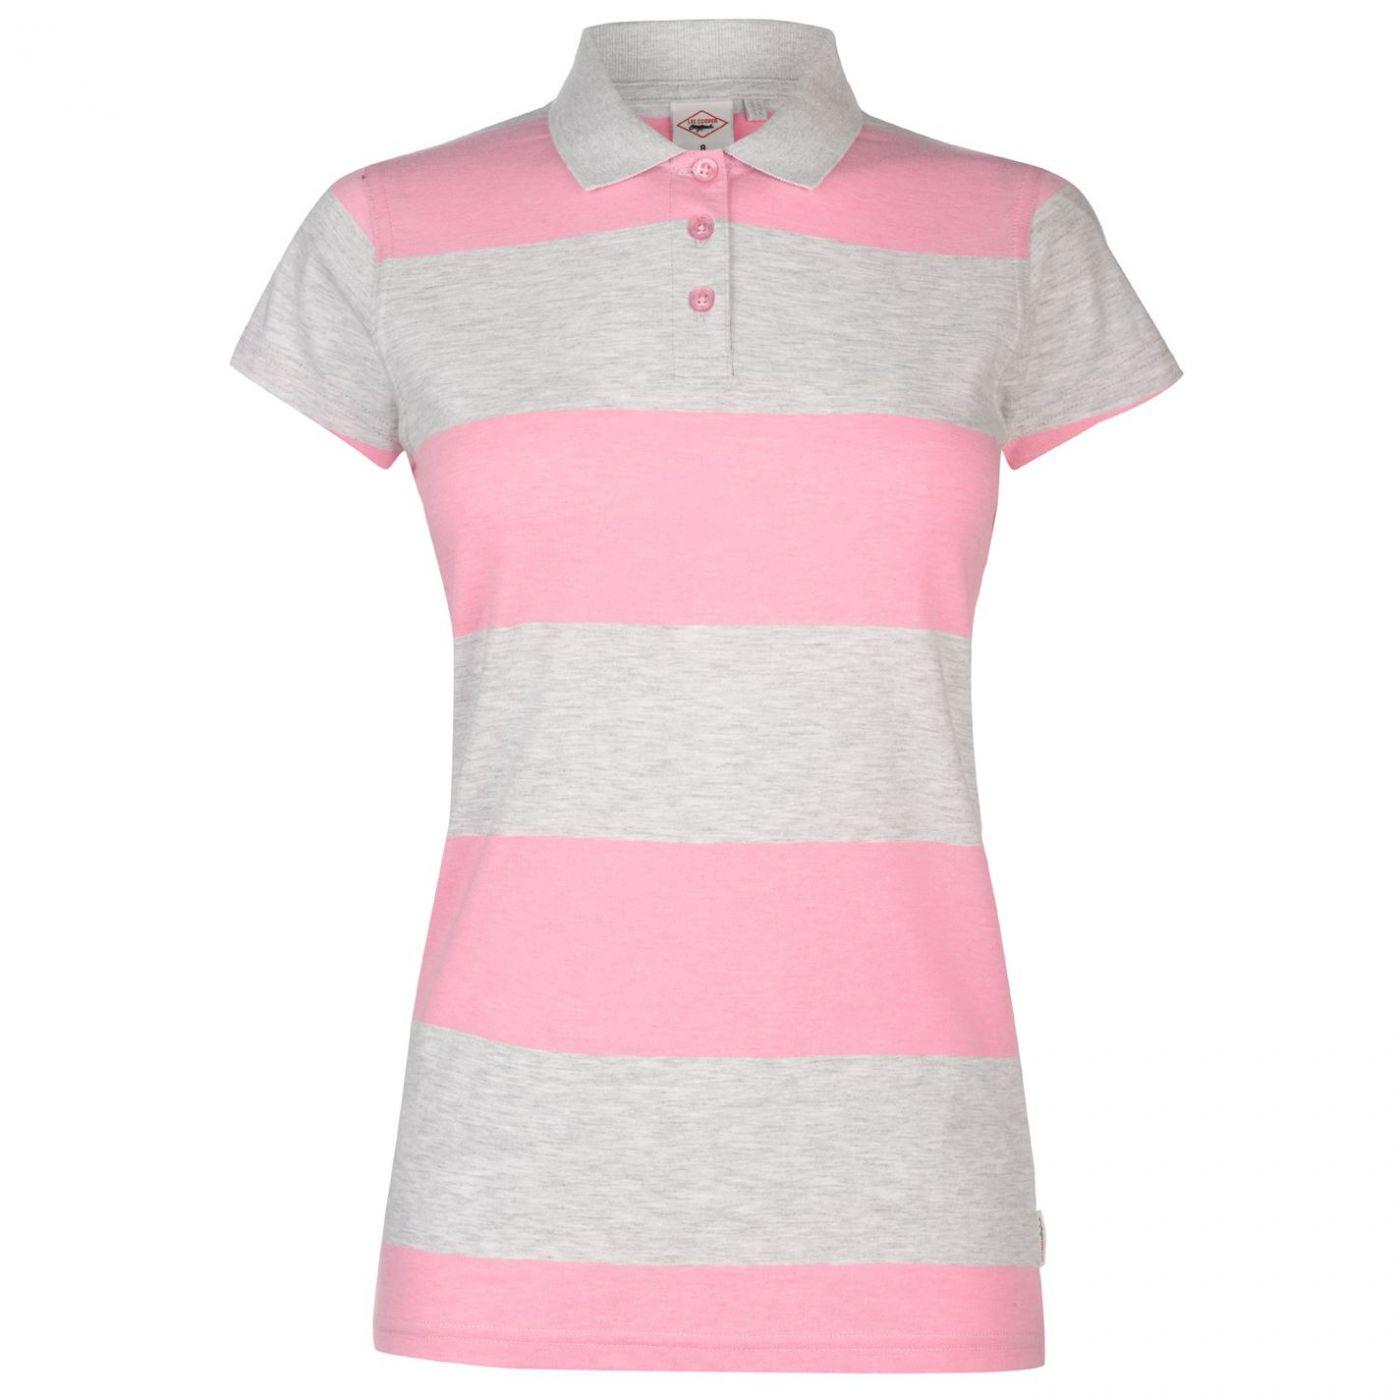 Lee Cooper Block Stripe Polo Shirt Ladies